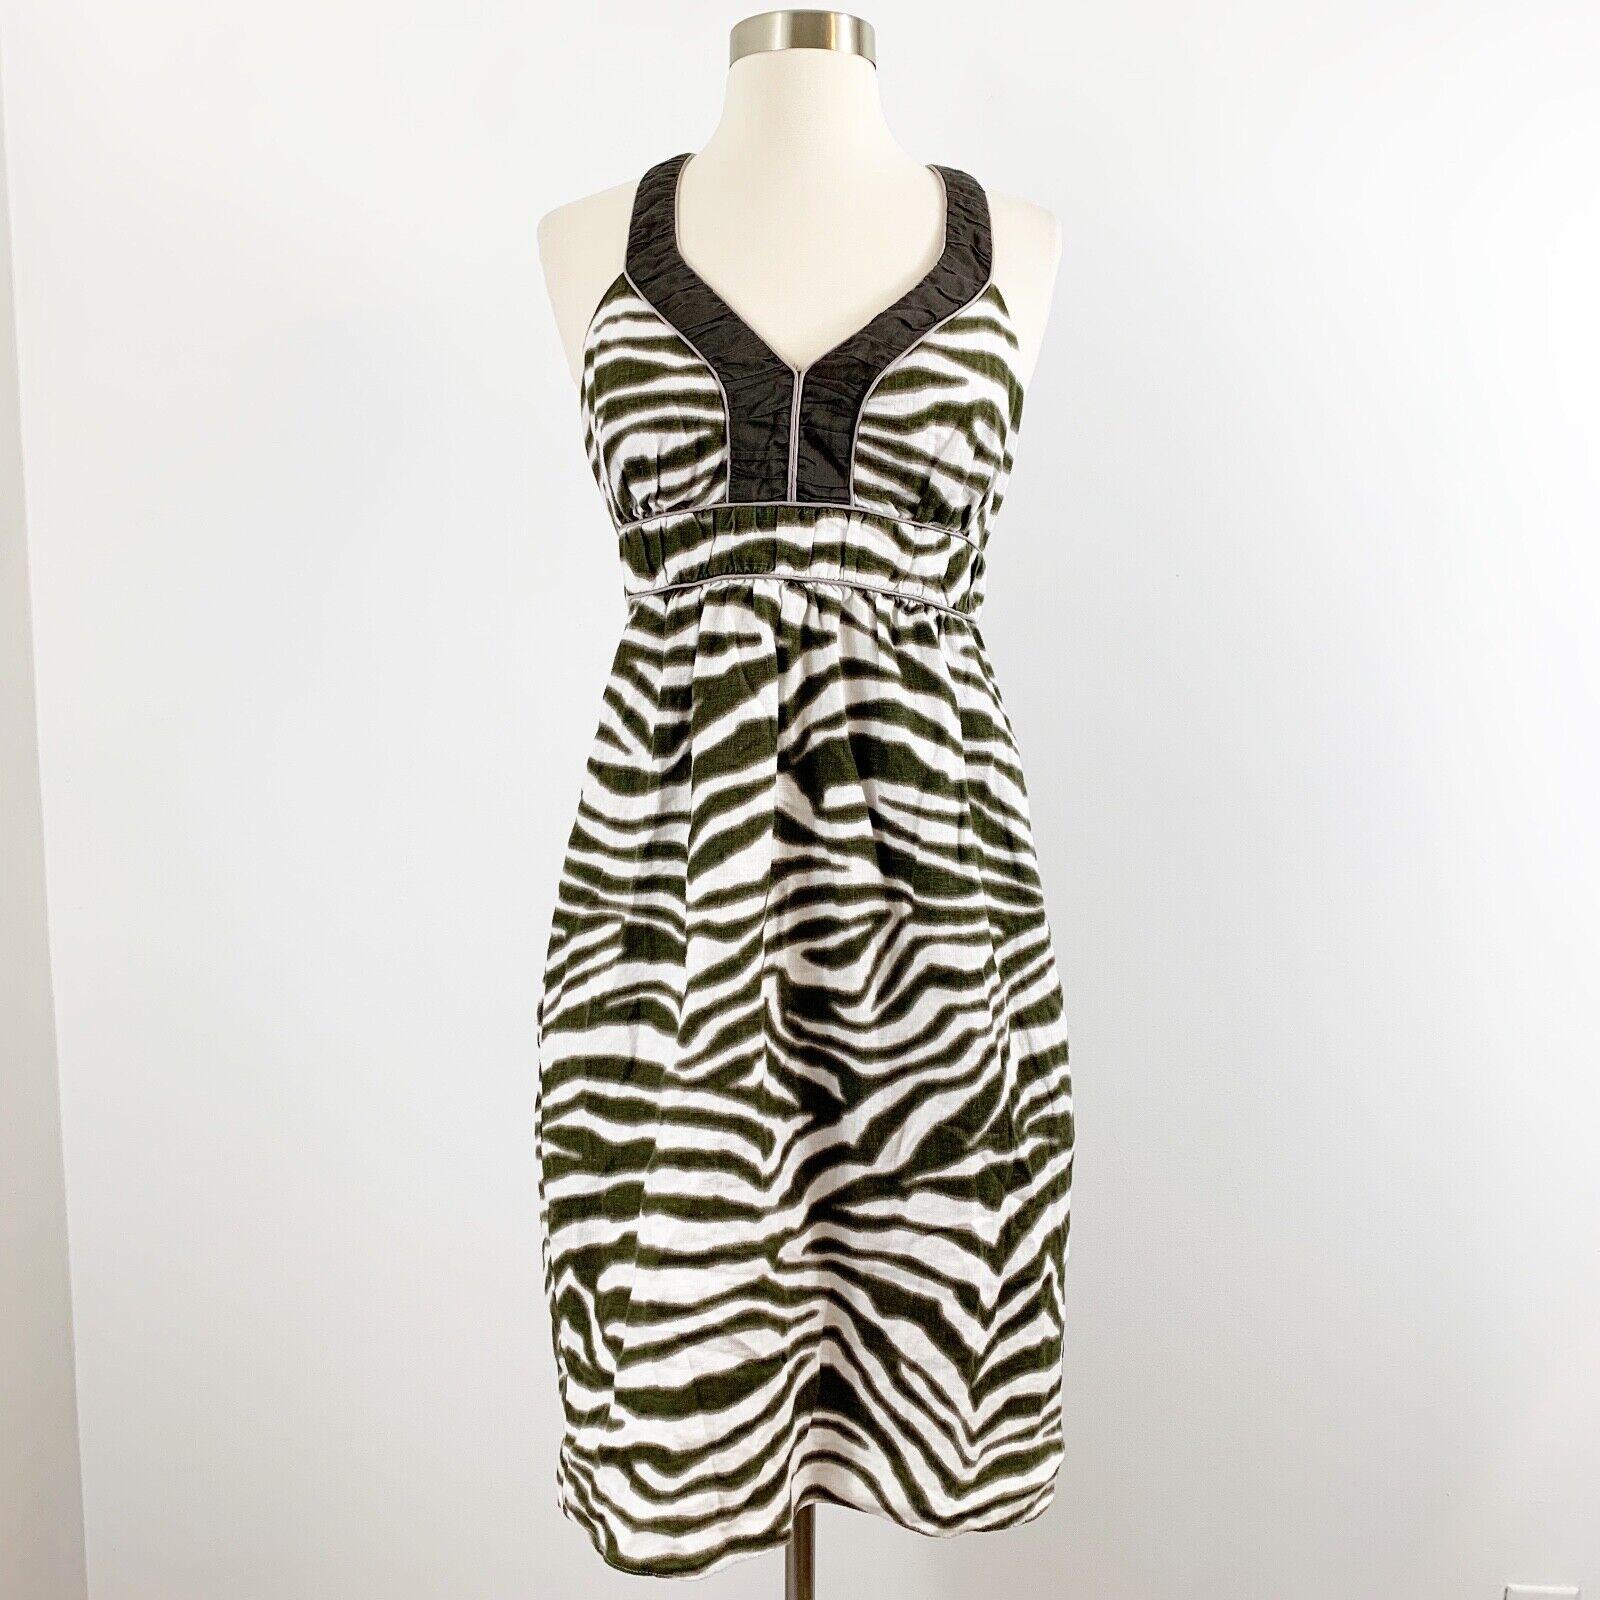 Banana Republic Animal Print Dress Size 4 Linen Cross Back Straps V Neck